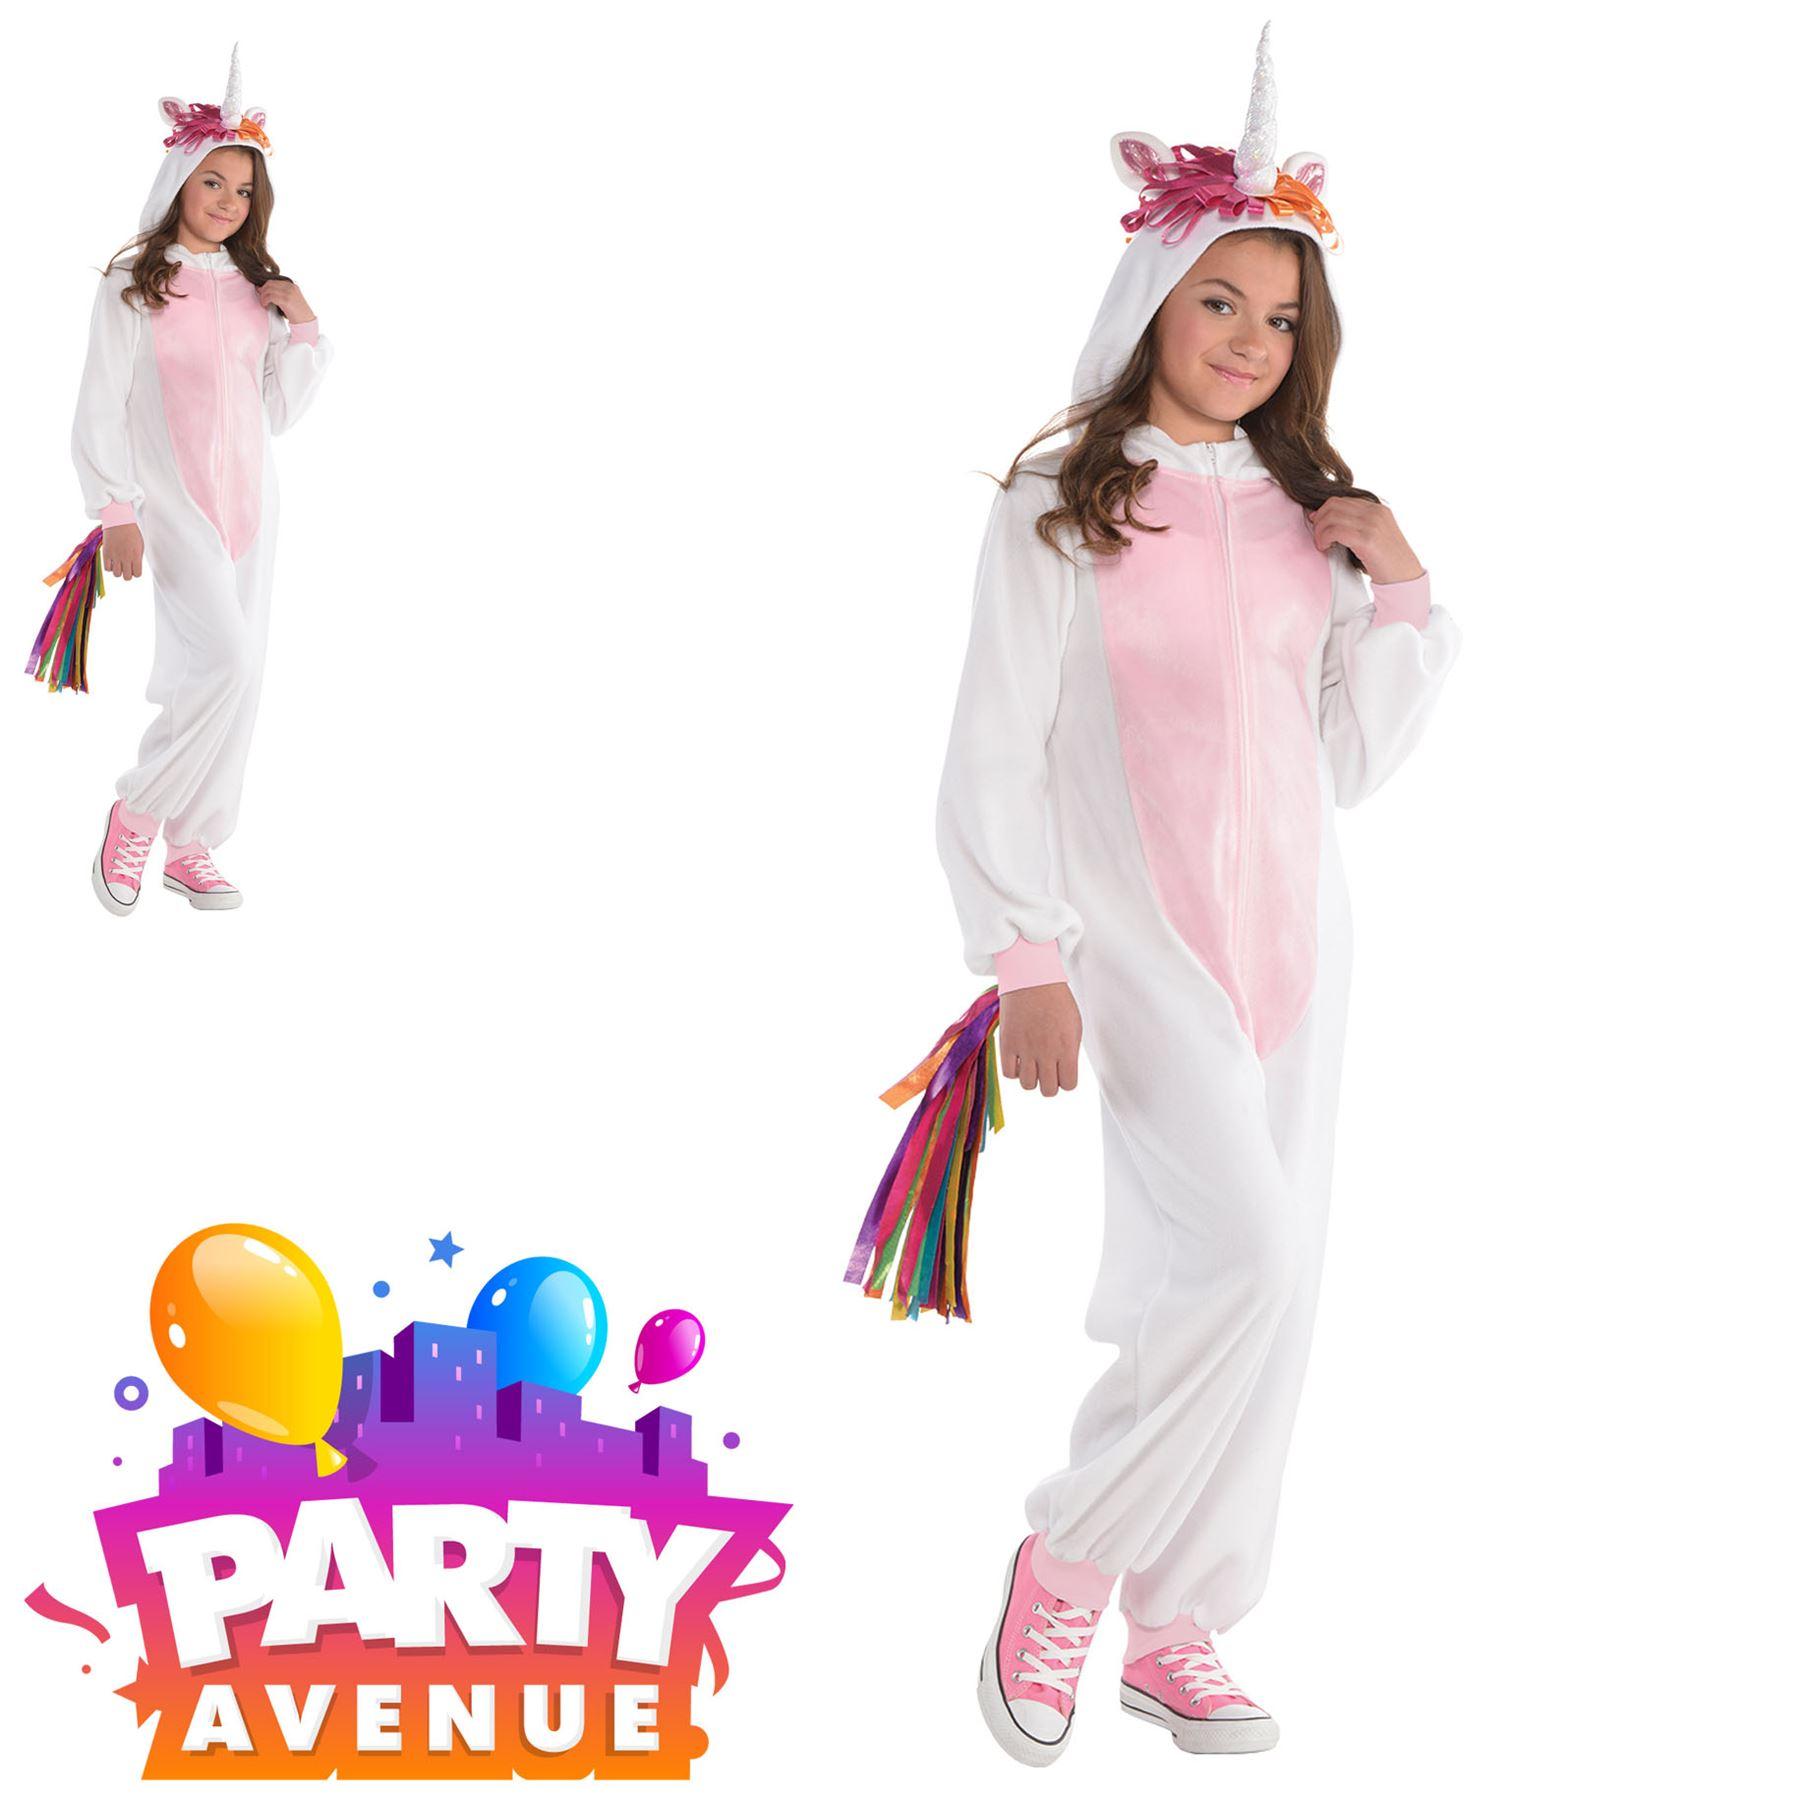 0cc300d2f972 Details about Girls Teens Unicorn One Piece Jumpsuit Magical Fancy Dress Up  Costume